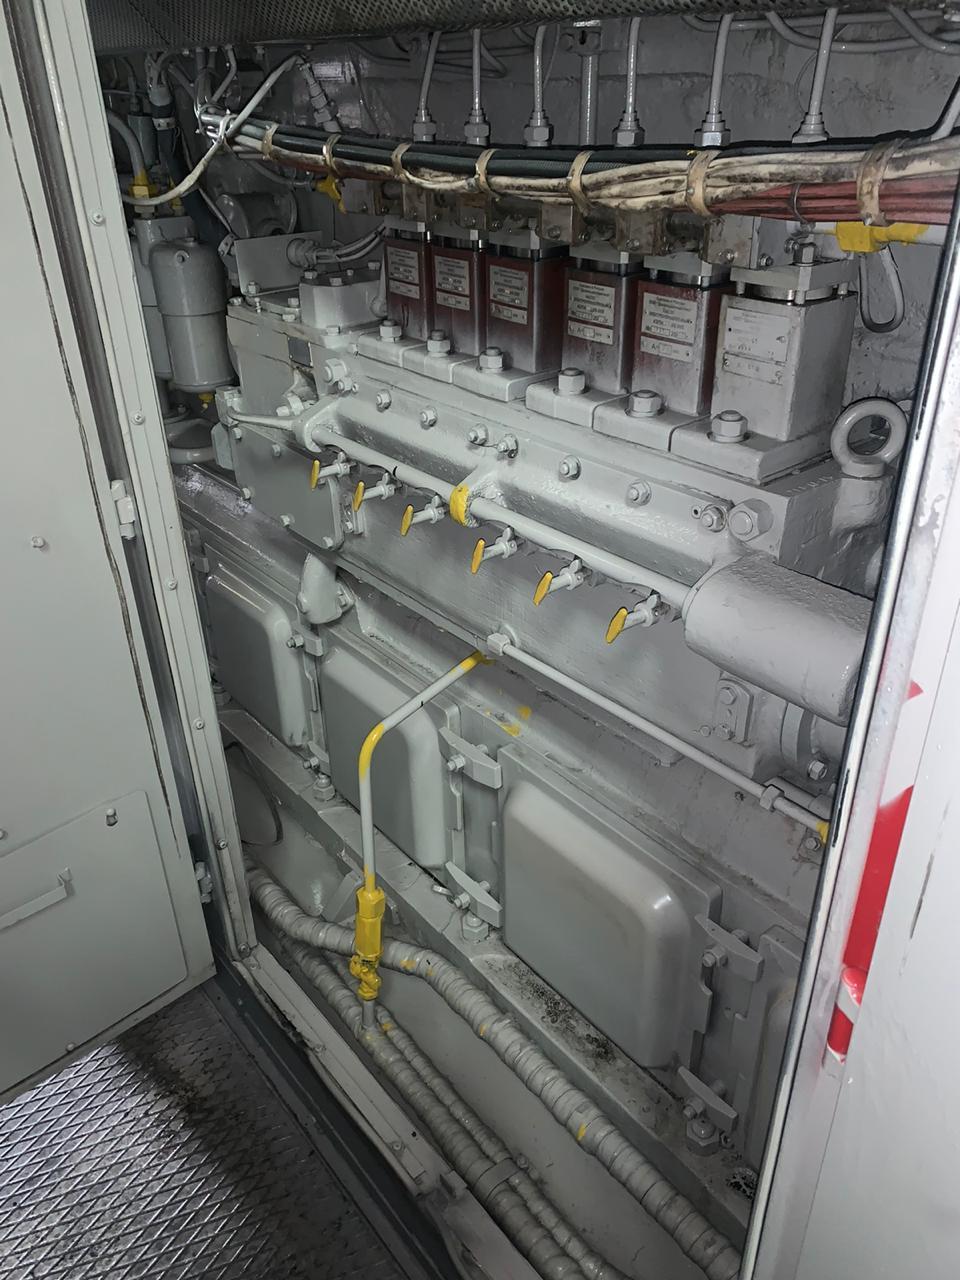 Тепловоз ТЭМ 18 после ремонта.